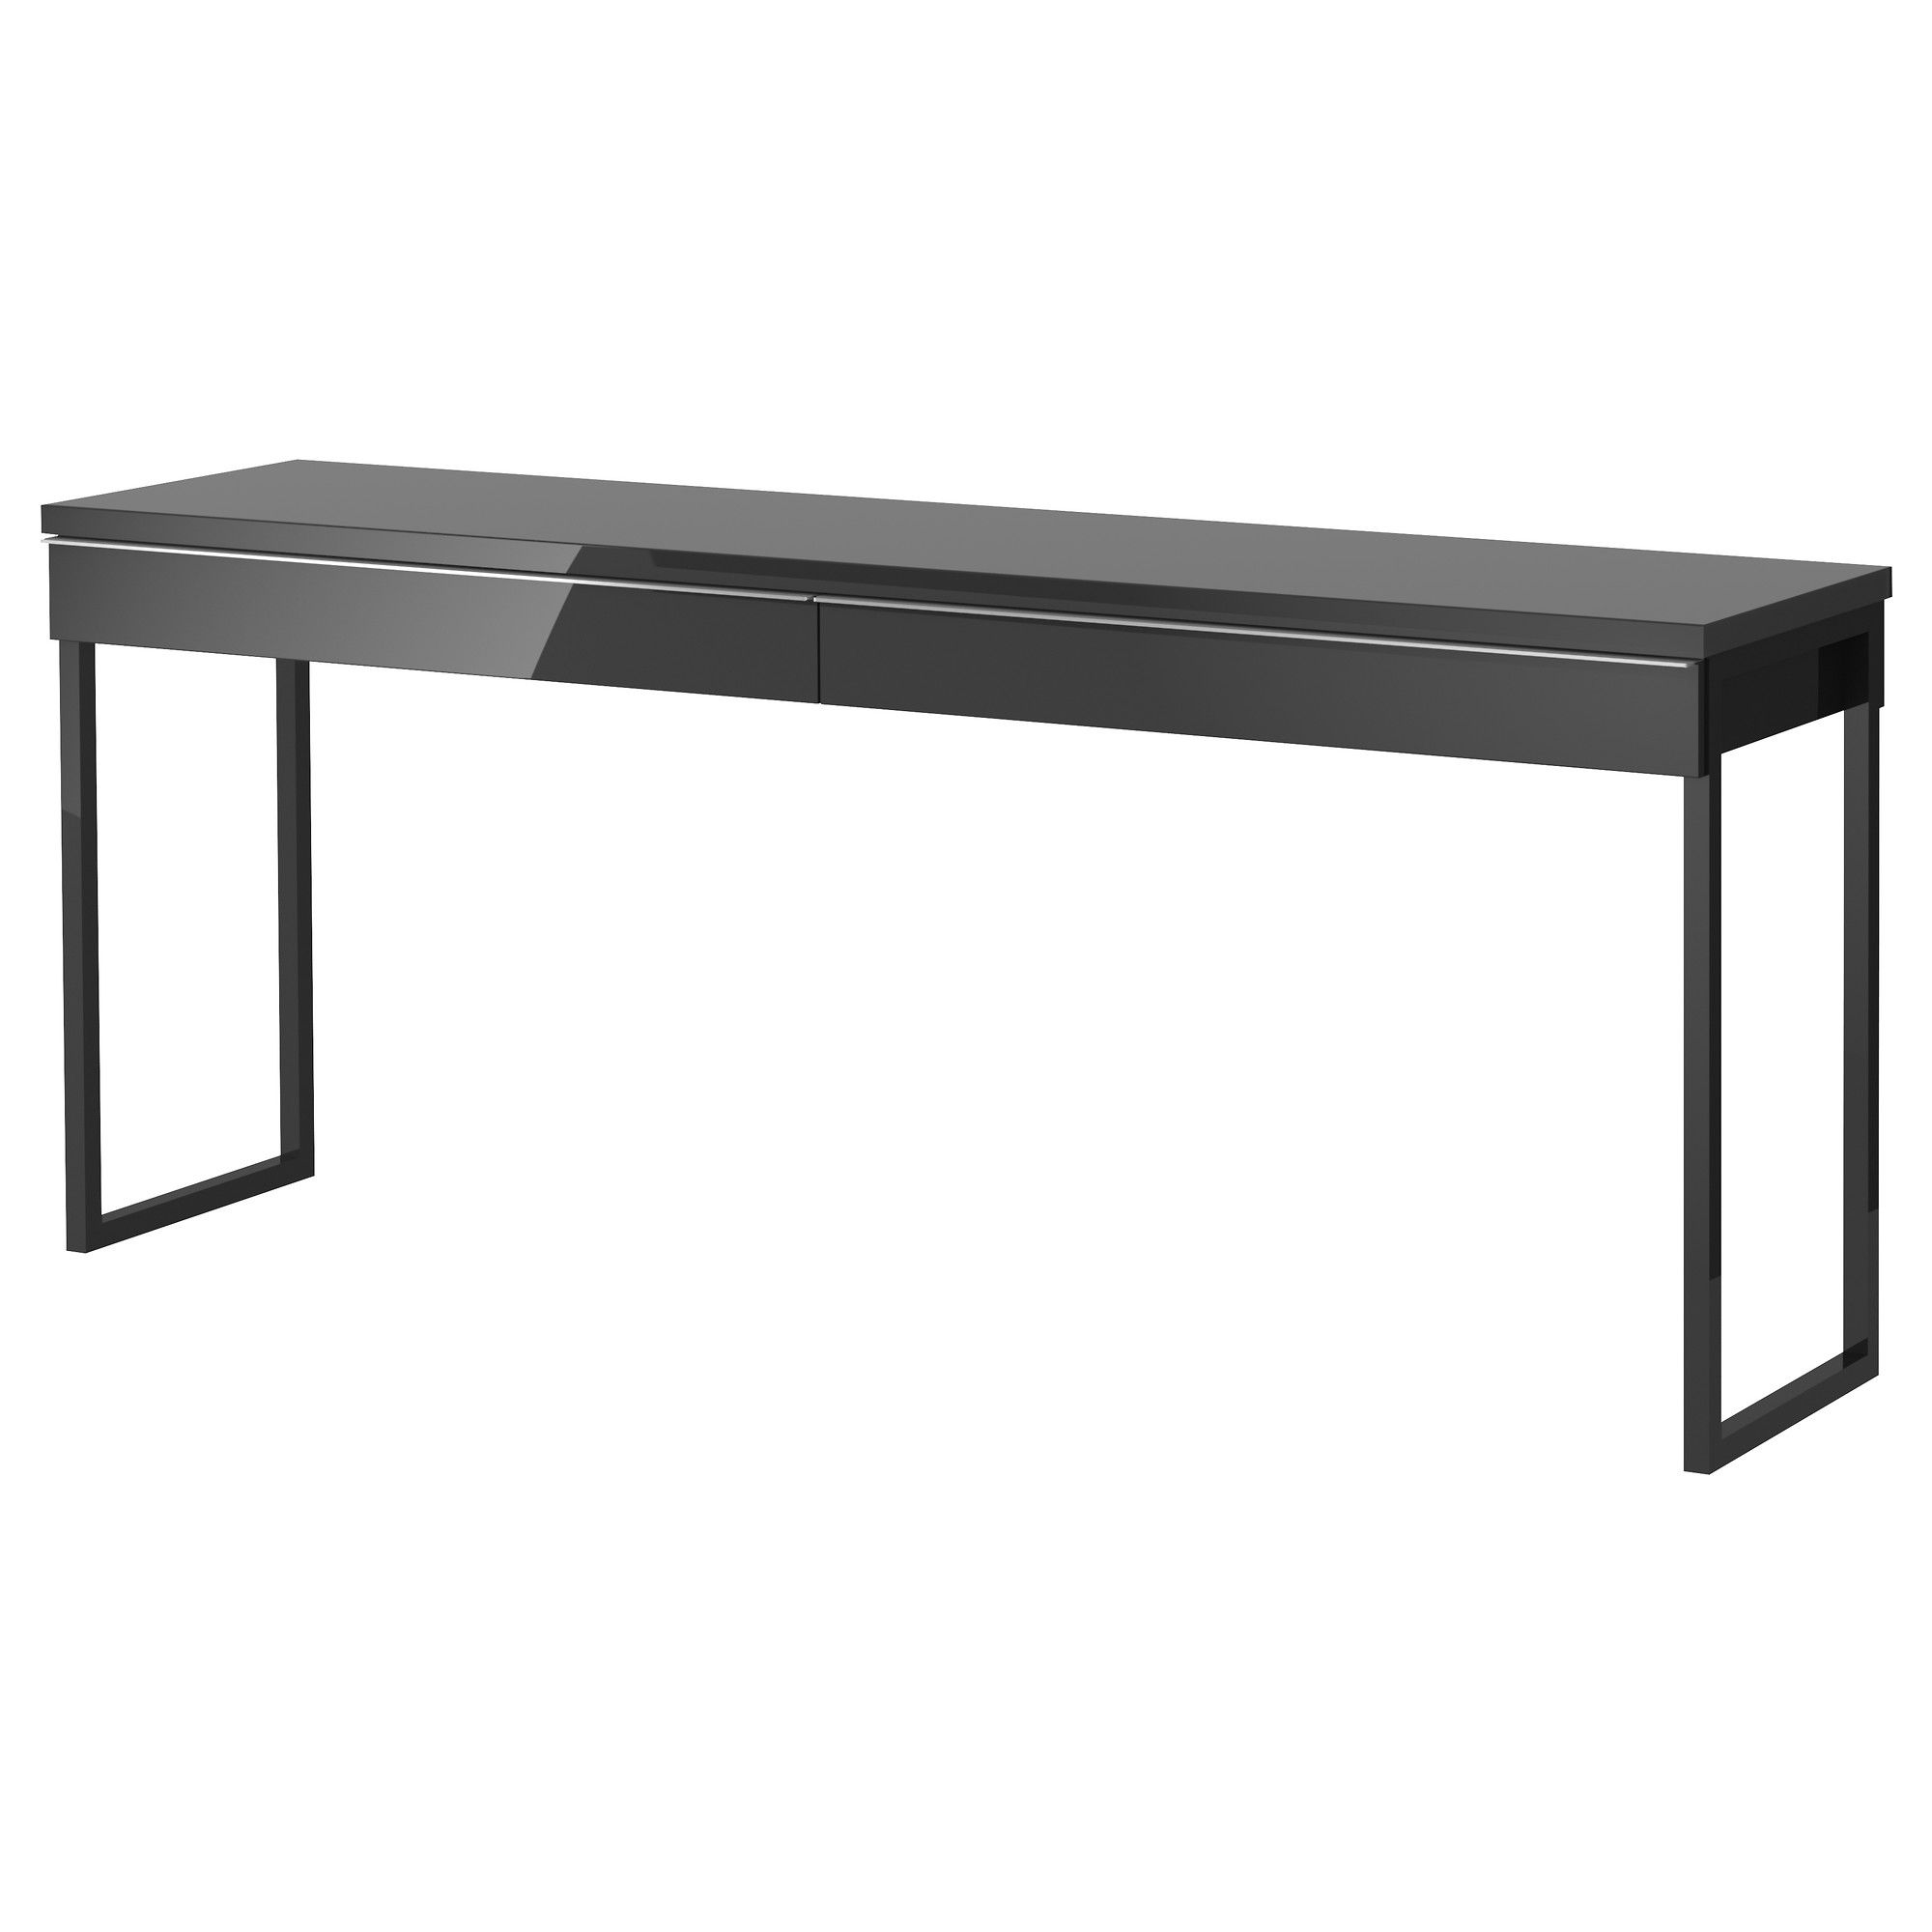 70 inch long sofa table square feet uk besta burs narrow desk dimensions width 7 8